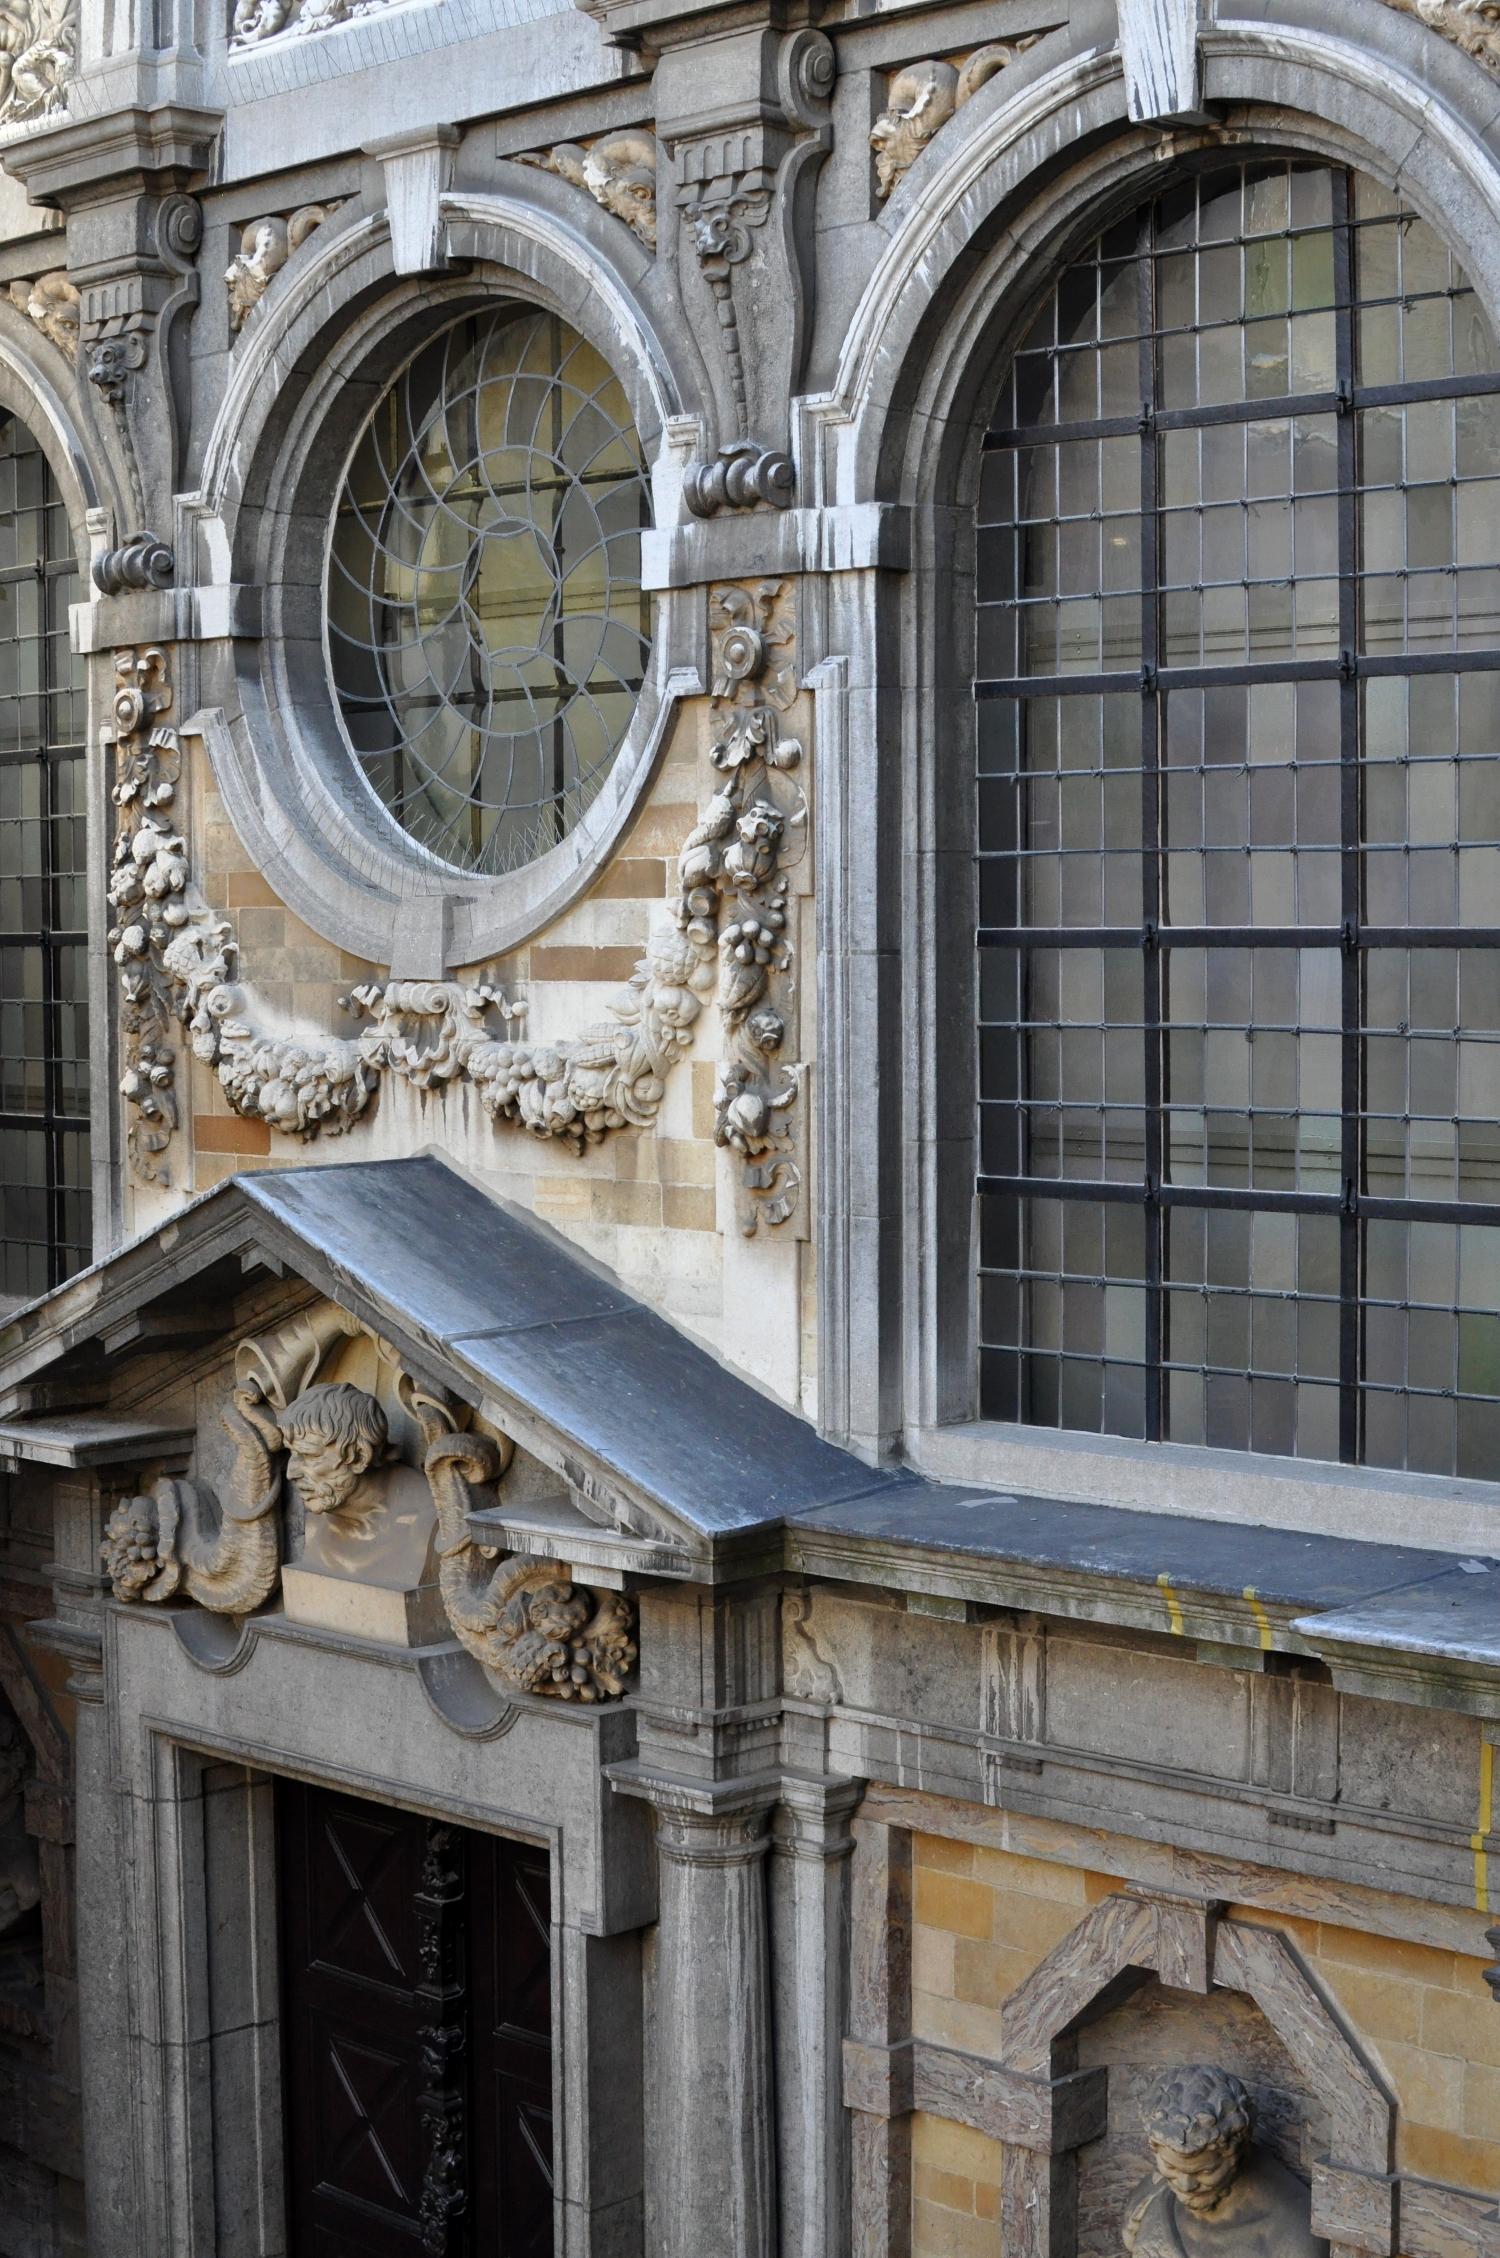 rocaille-blog-rubens-house-rubenhuis-anversa-antwerpen-fiandre-flanders-19